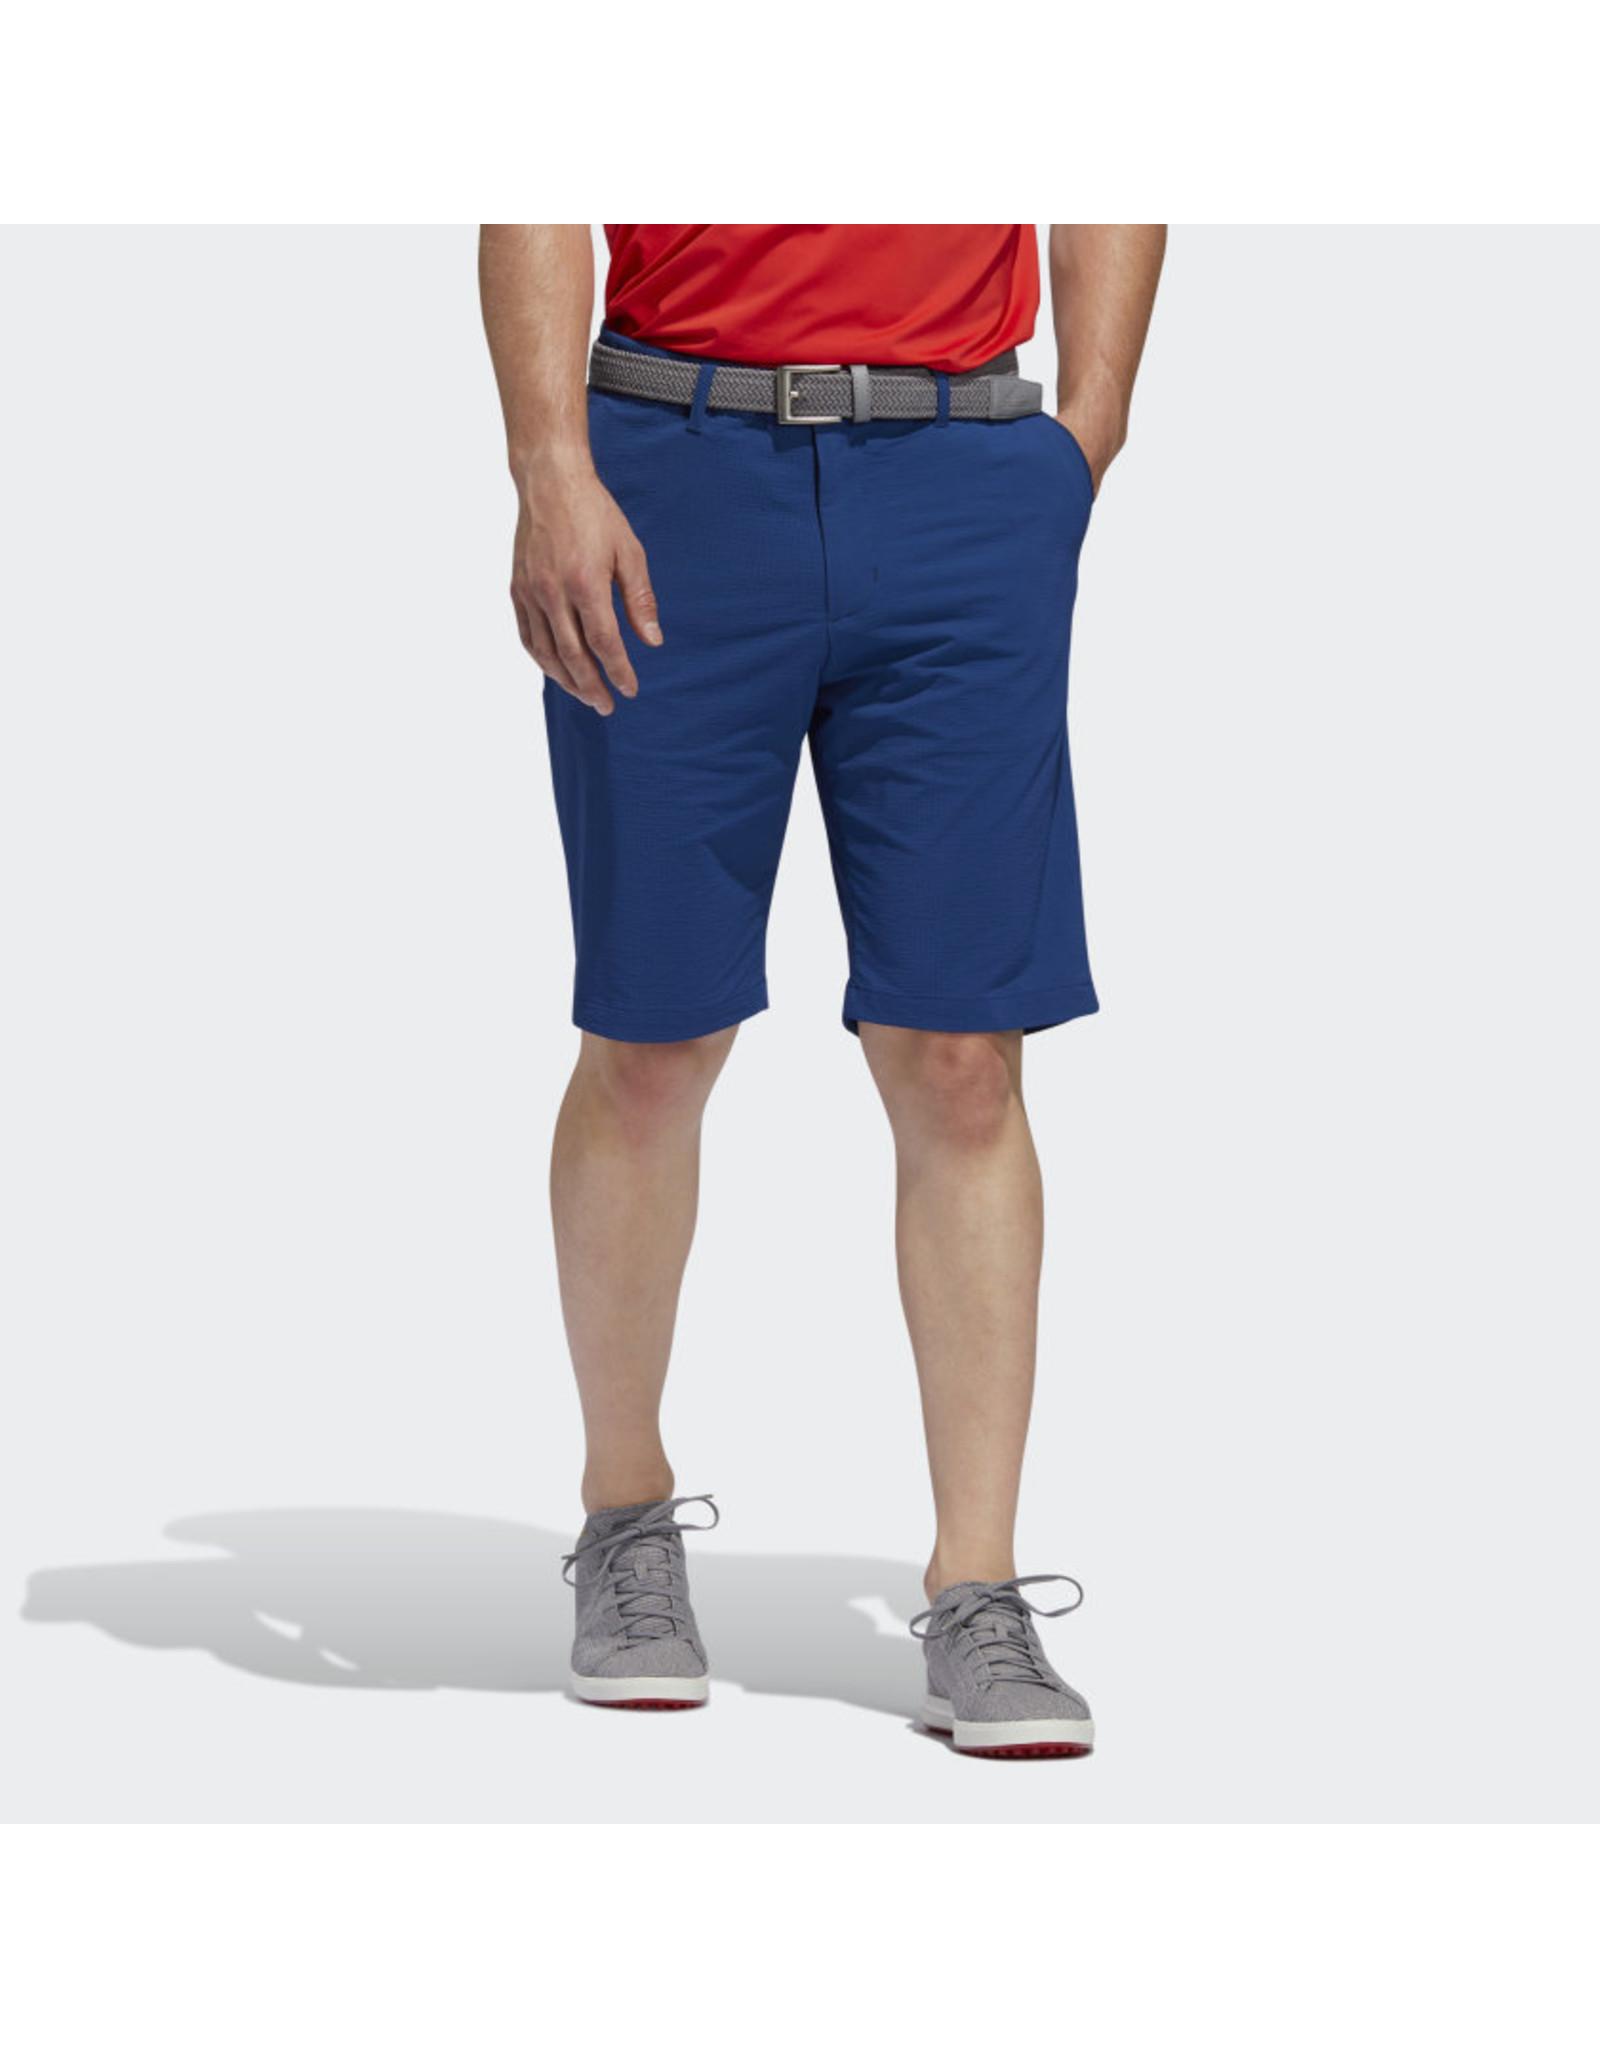 Adidas Adipure Mens Shorts SRSKR